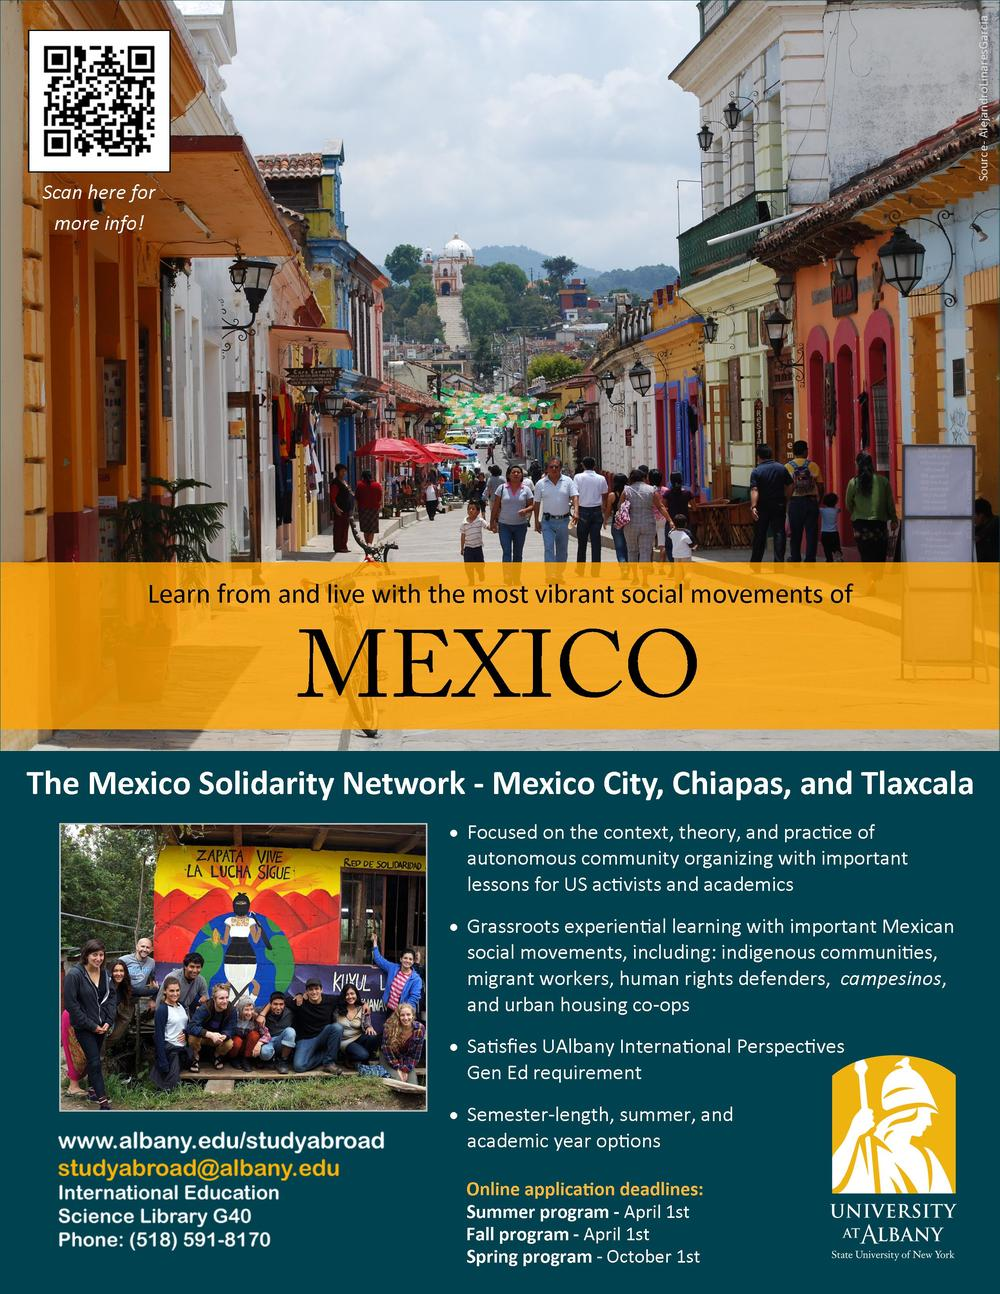 Mexico 2013.jpg